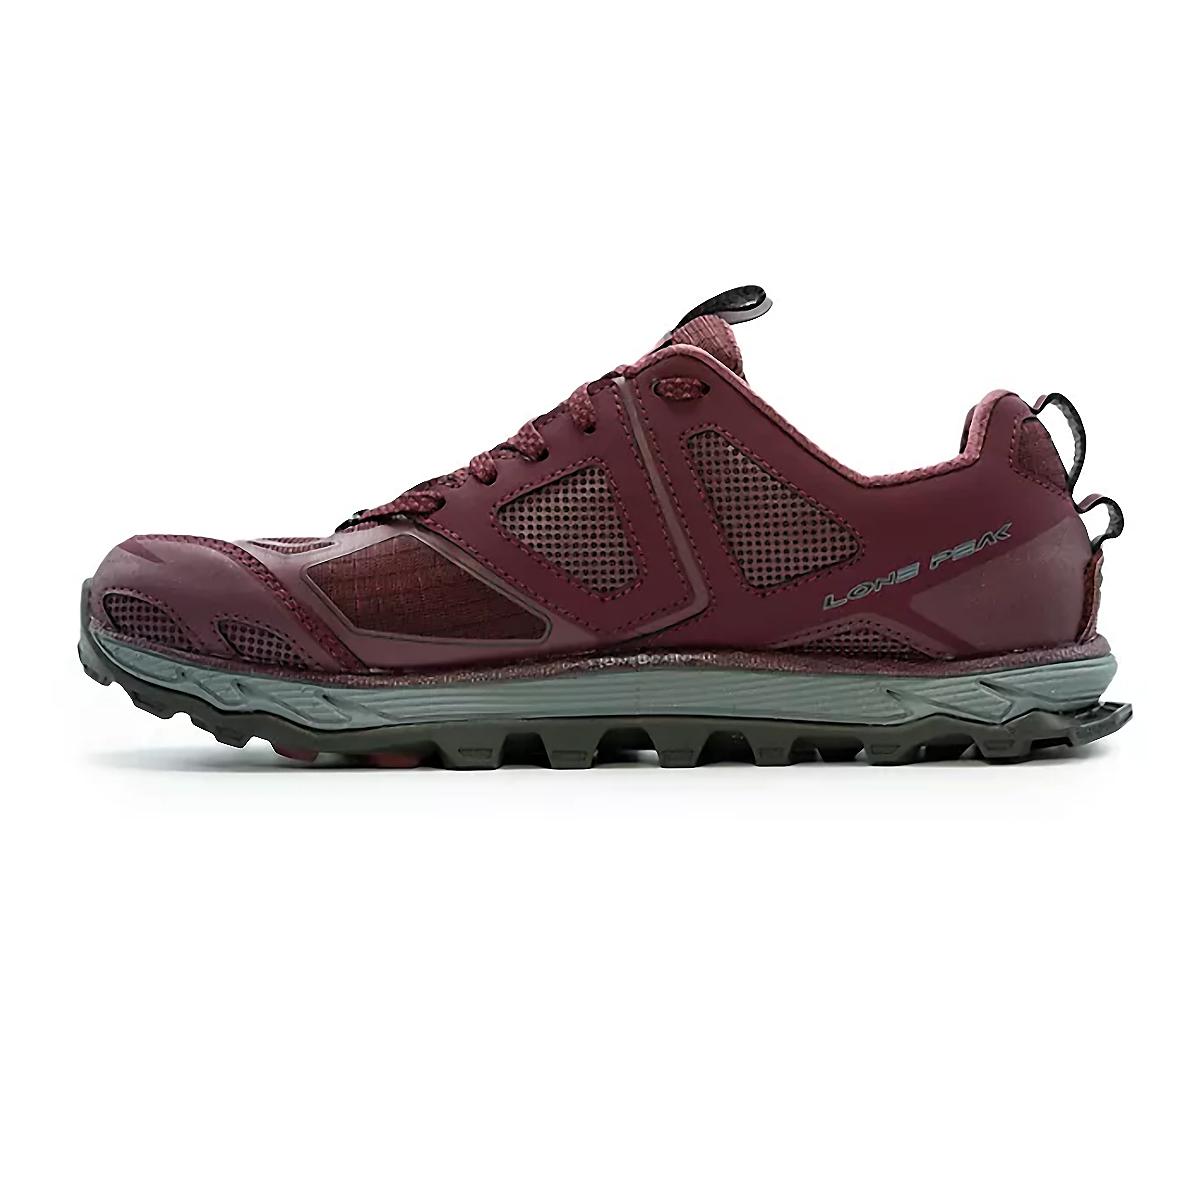 Women's Altra Lone Peak 4.5 Low Trail Running Shoe - Color: Dark Port - Size: 5.5 - Width: Regular, Dark Port, large, image 2